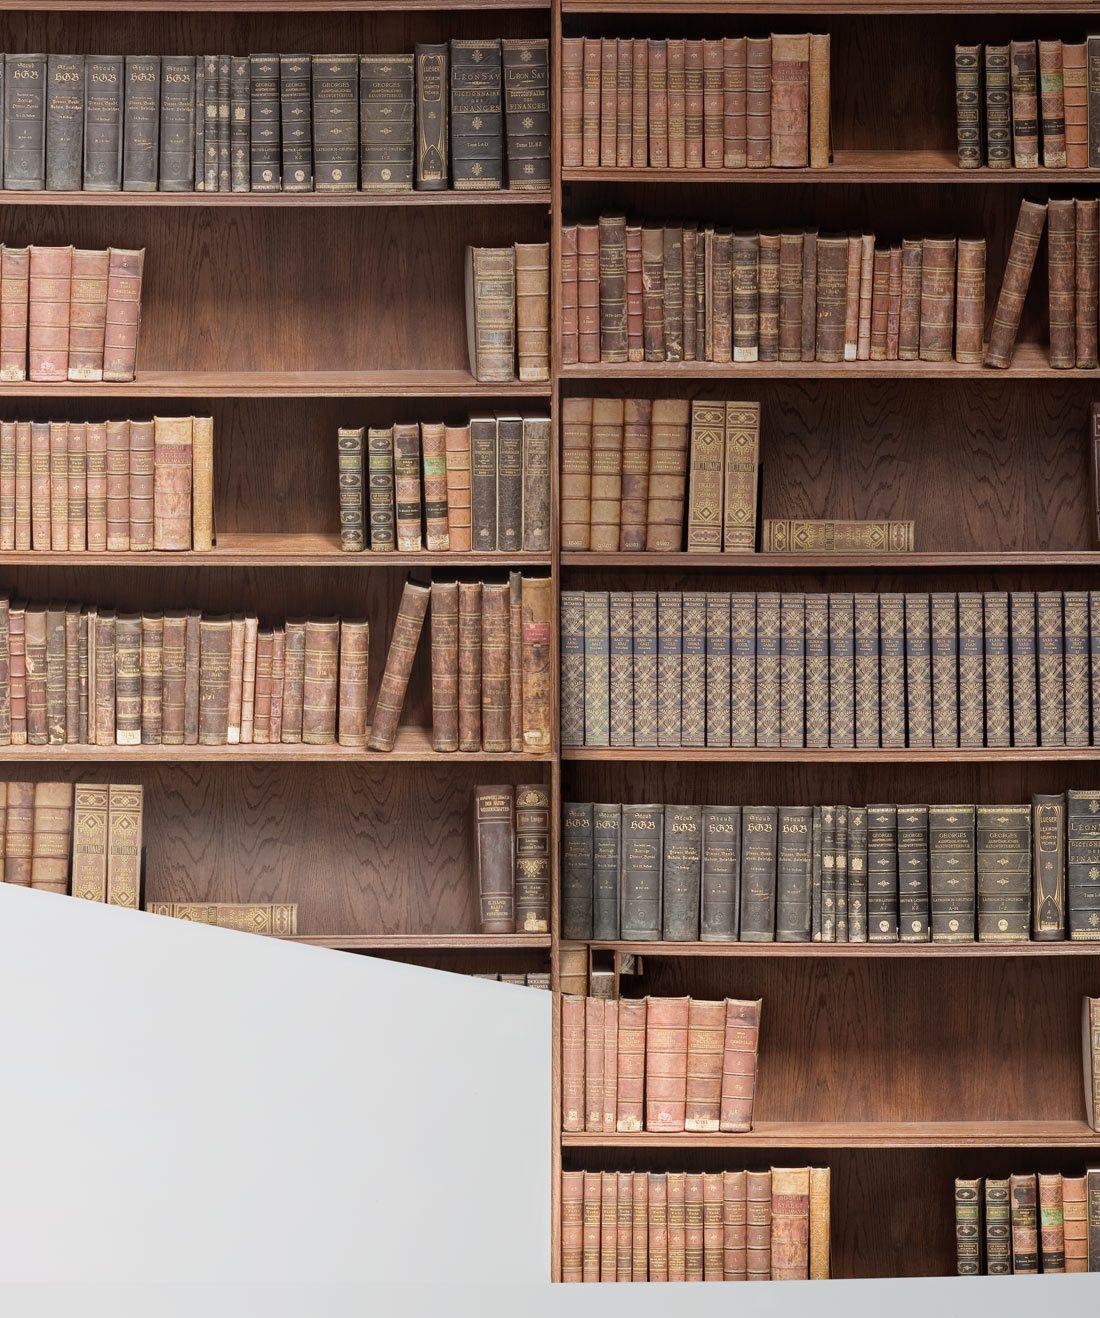 Bookshelf Wallpaper Realistic Library Design Milton King